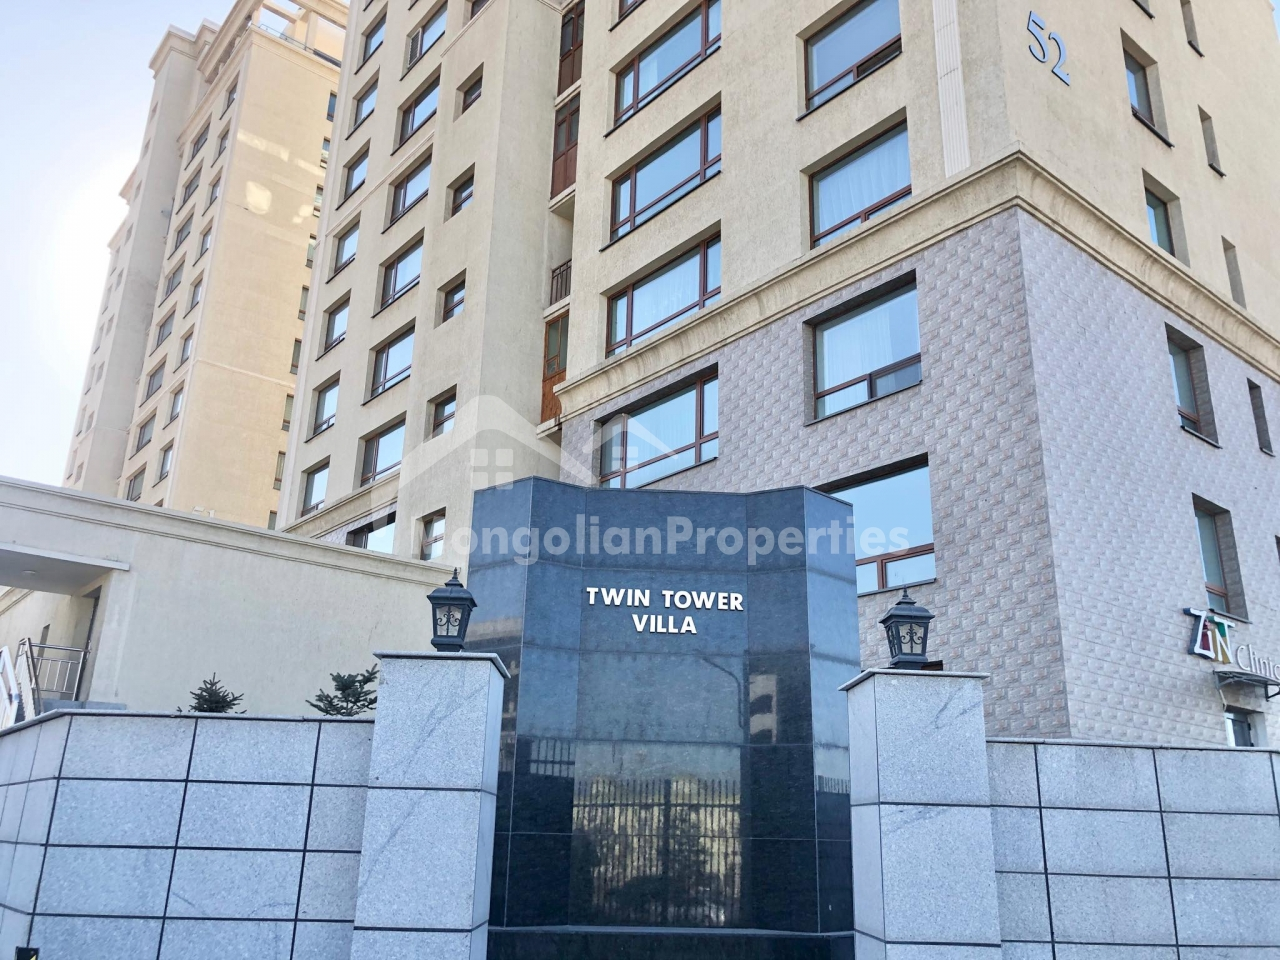 4 bedroom apartment Тwin Tower Luxury Villa at Yarmag British School